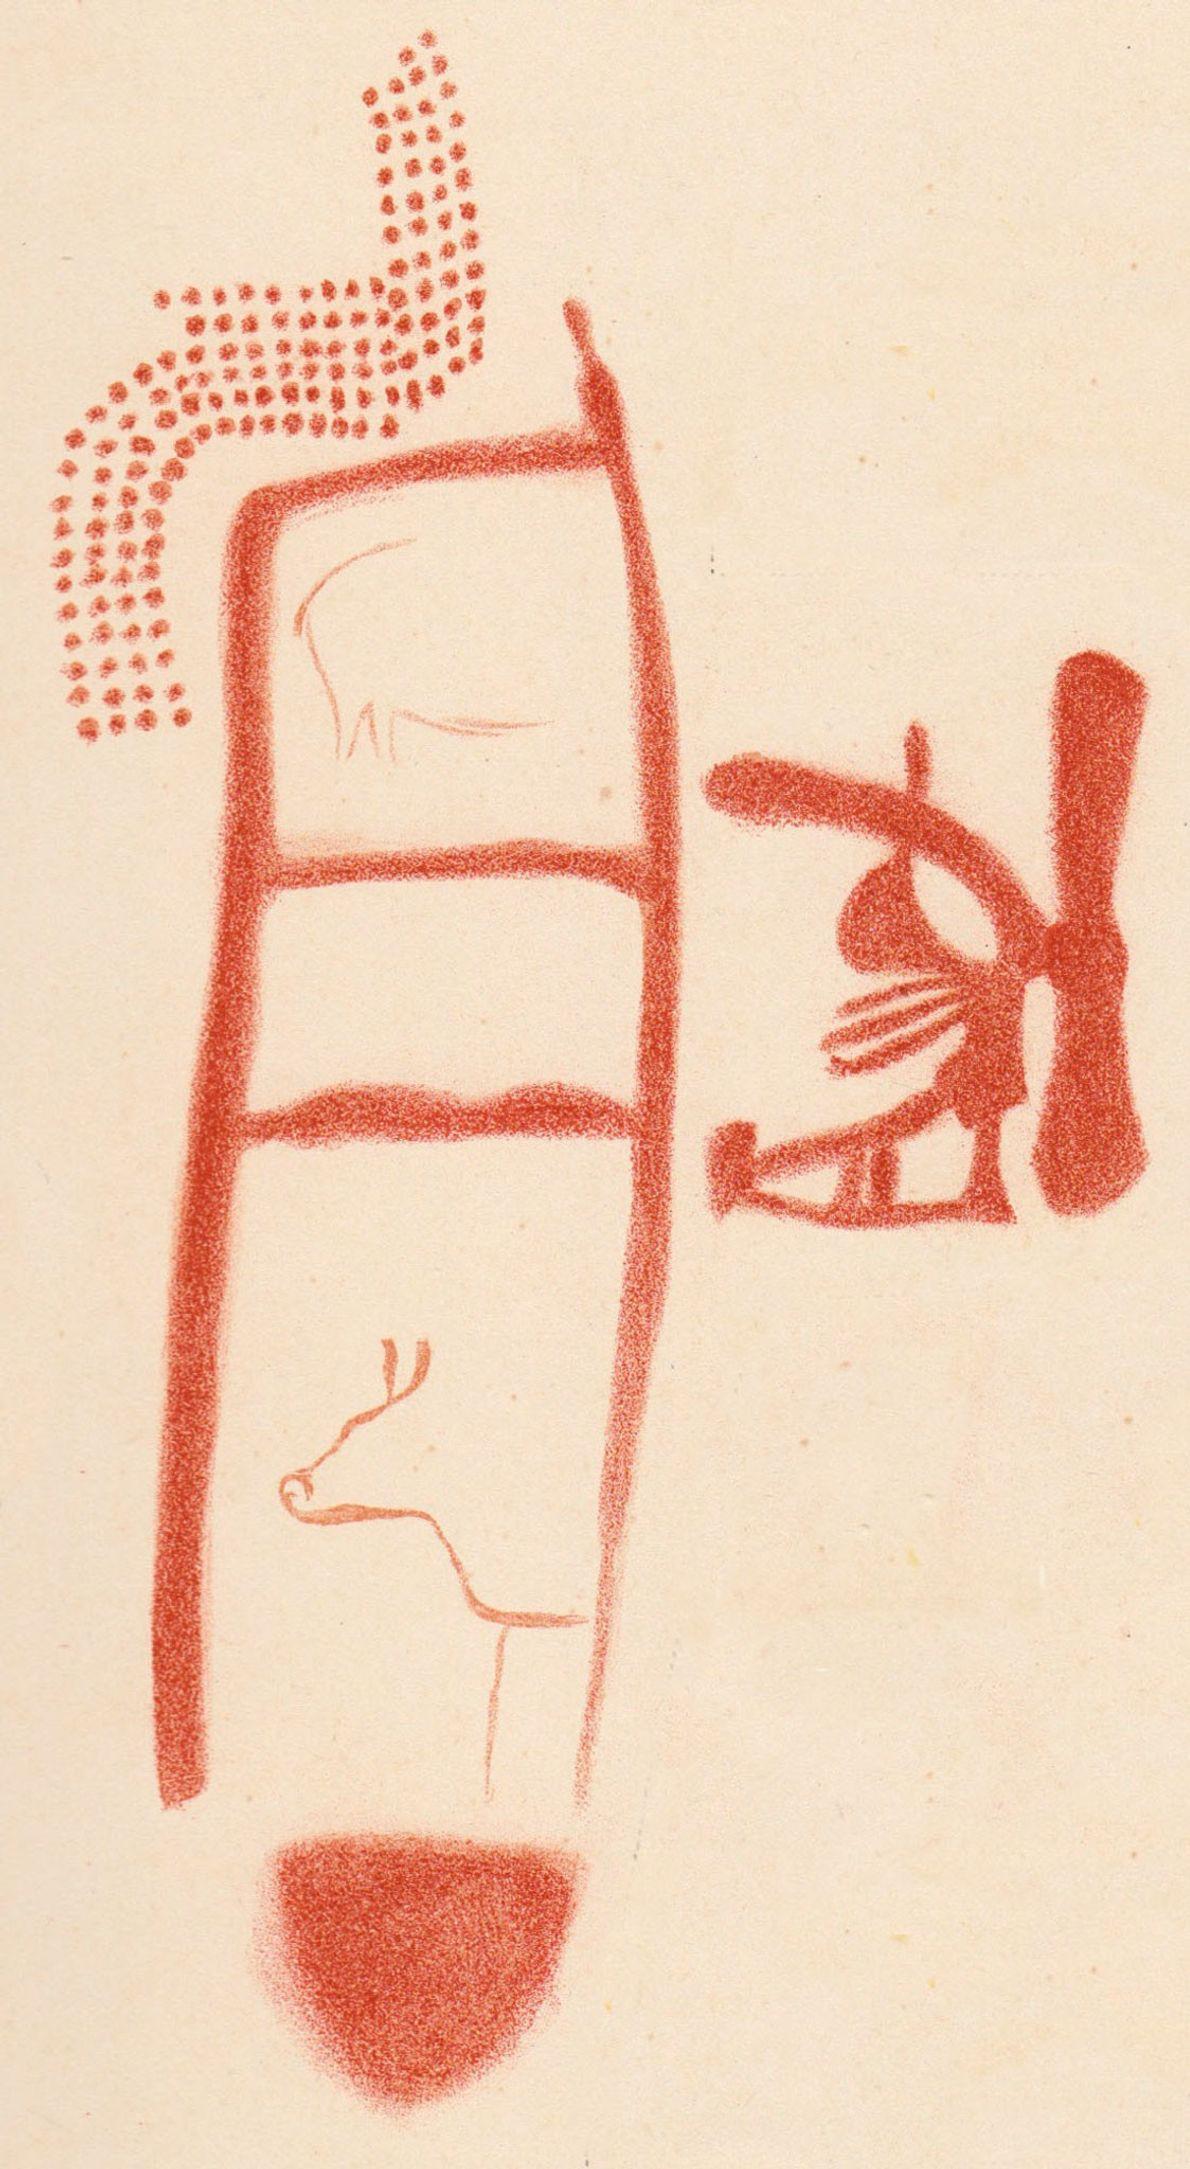 arte-rupestre-neandertal